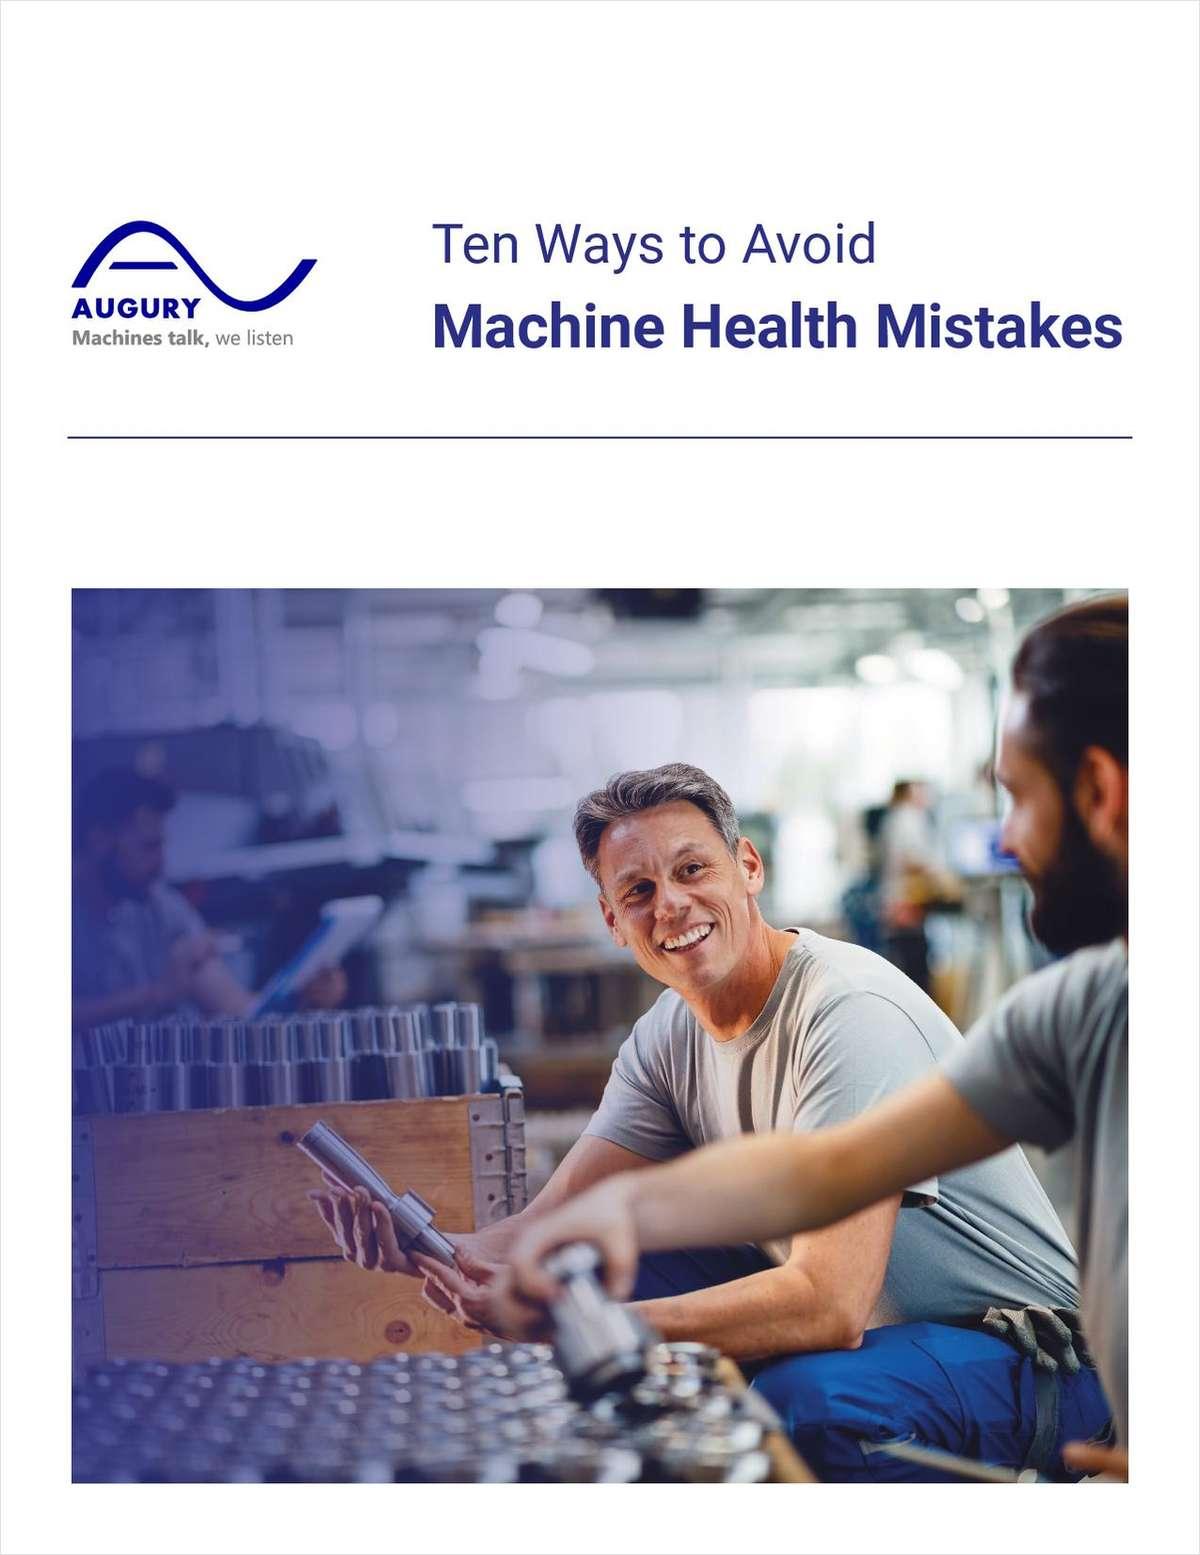 The Ten Best Ways Manufacturers Can Avoid Machine Health Mistakes